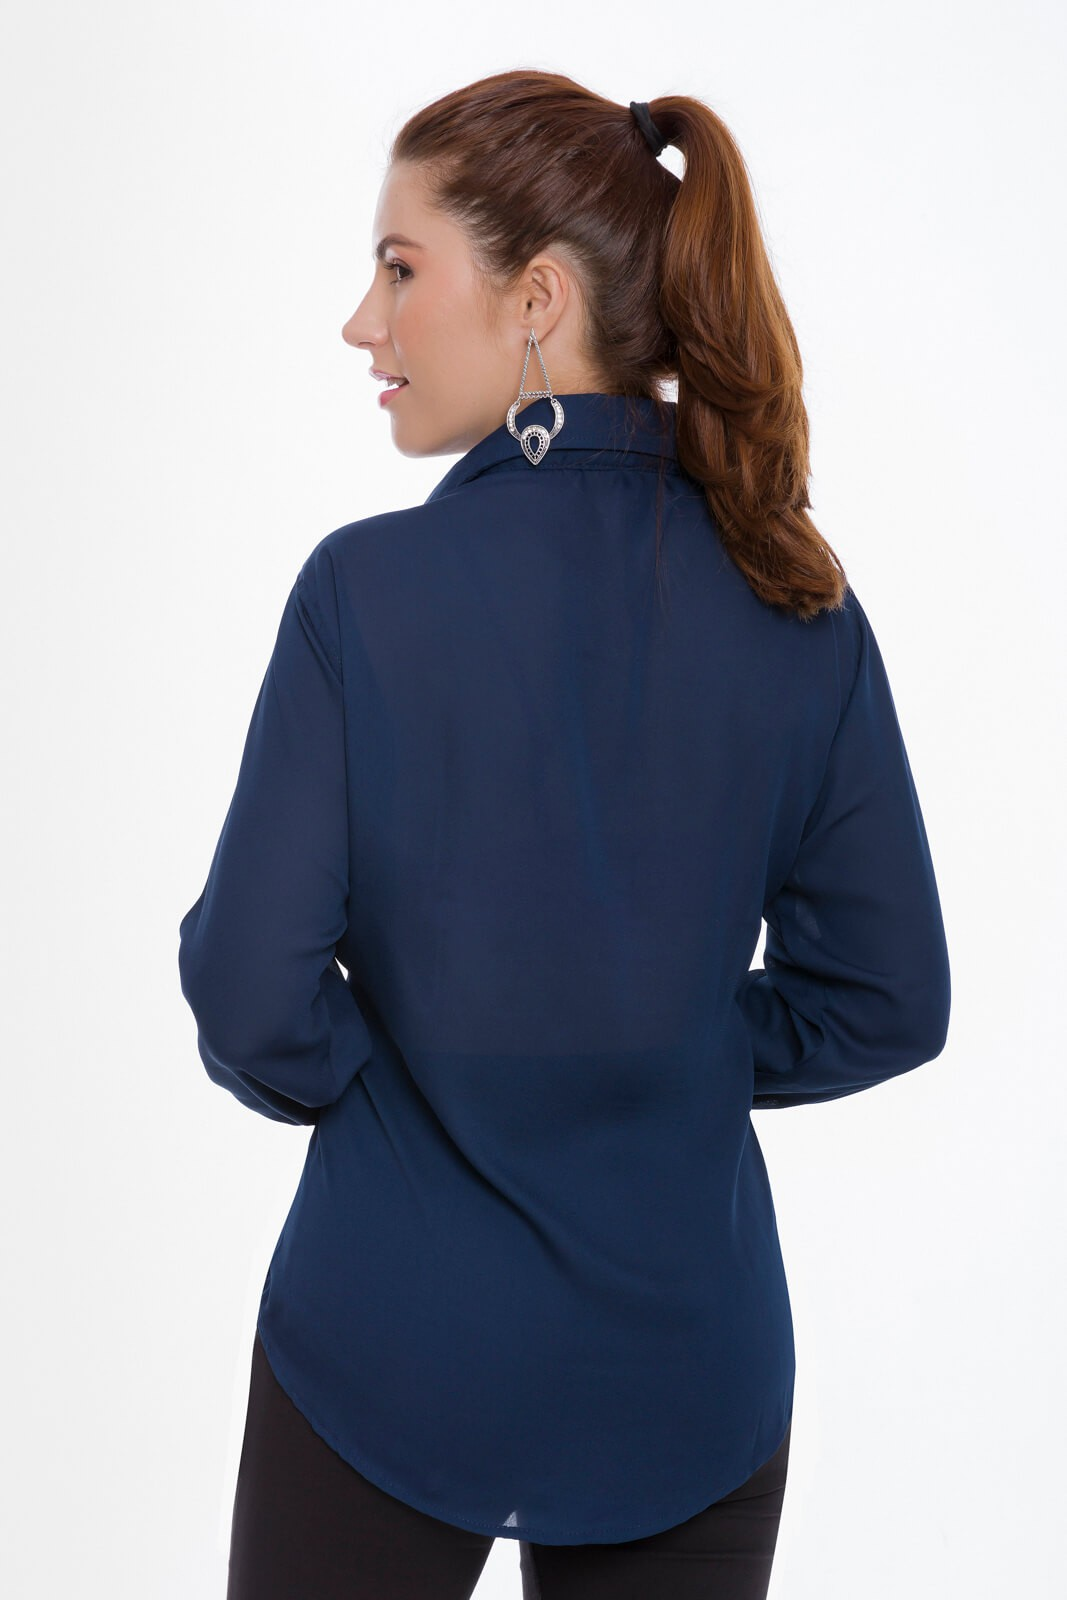 Camisa Feminina Olimpo Crepe Liso Manga Longa Azul Marinho